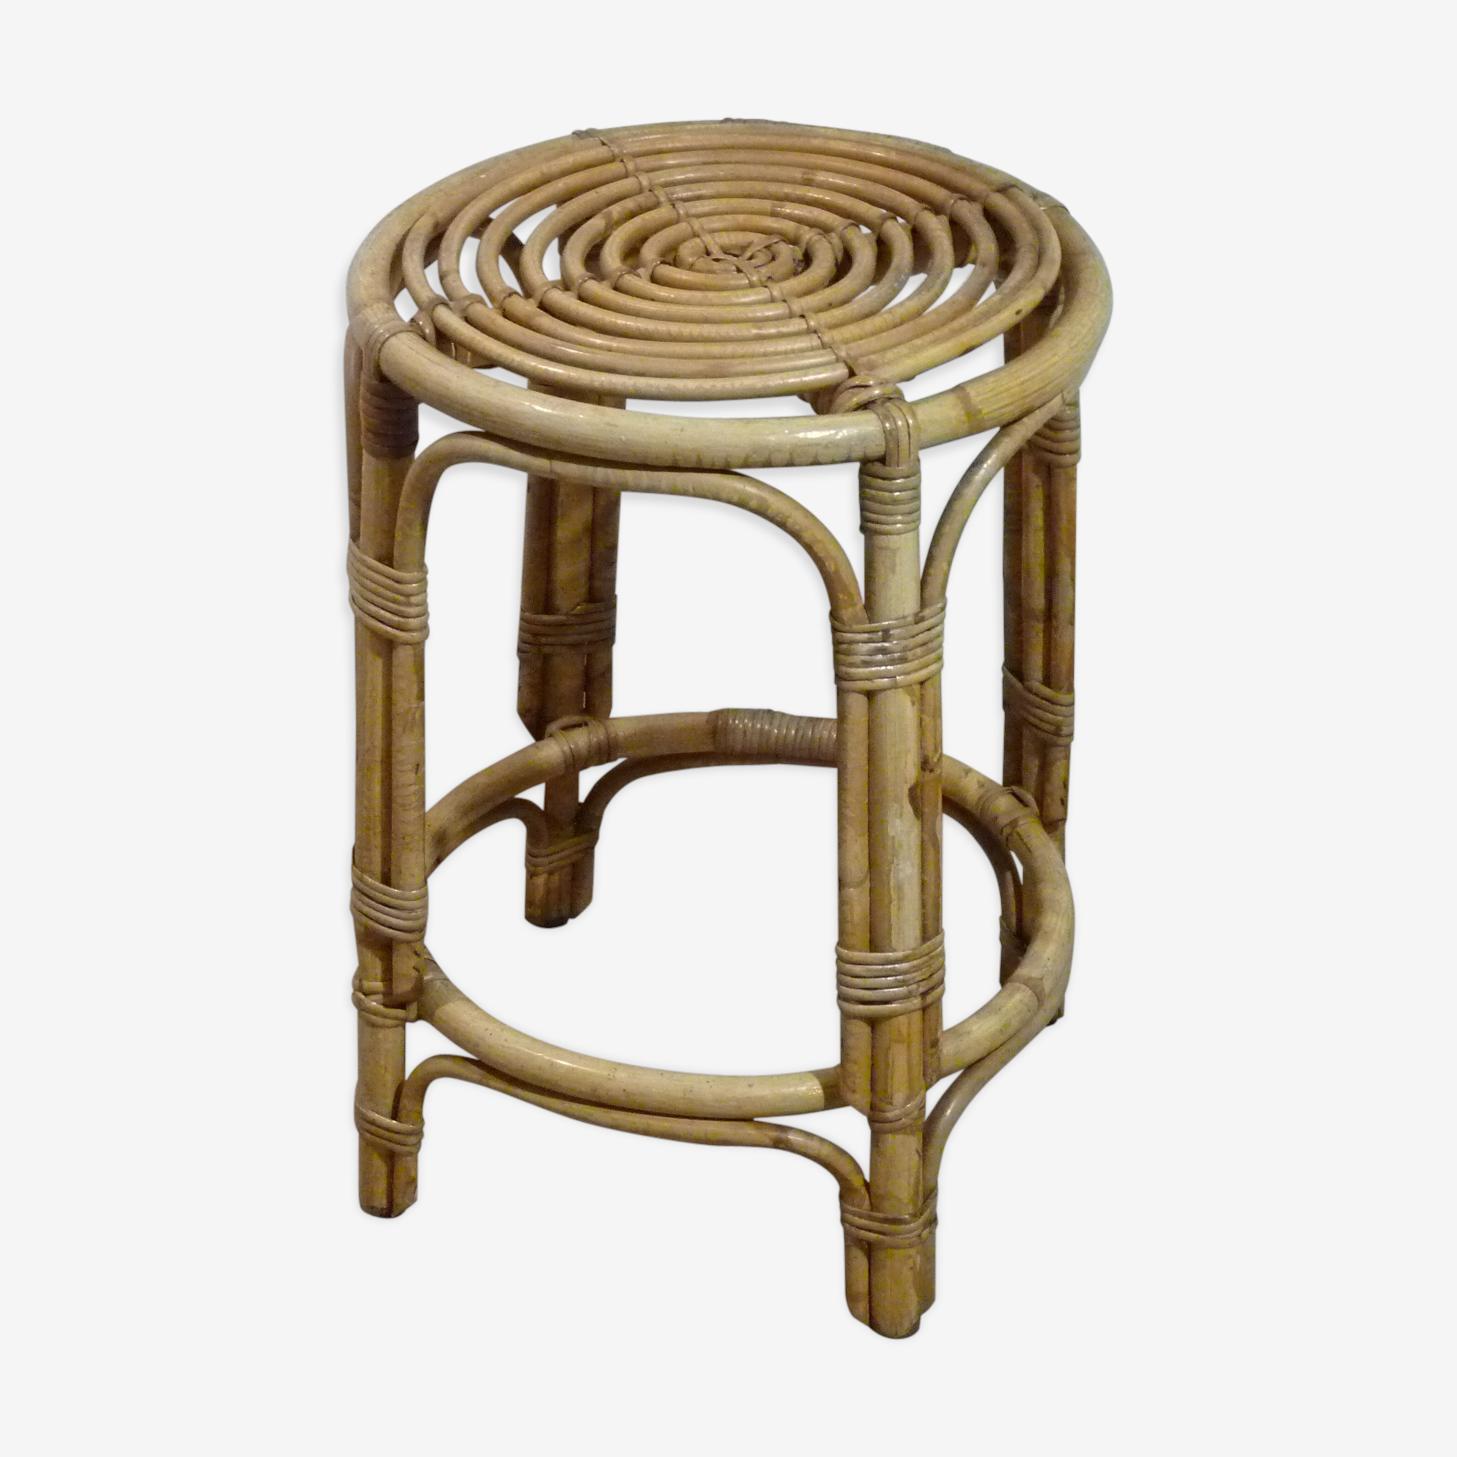 Pedestal table has rattan plant